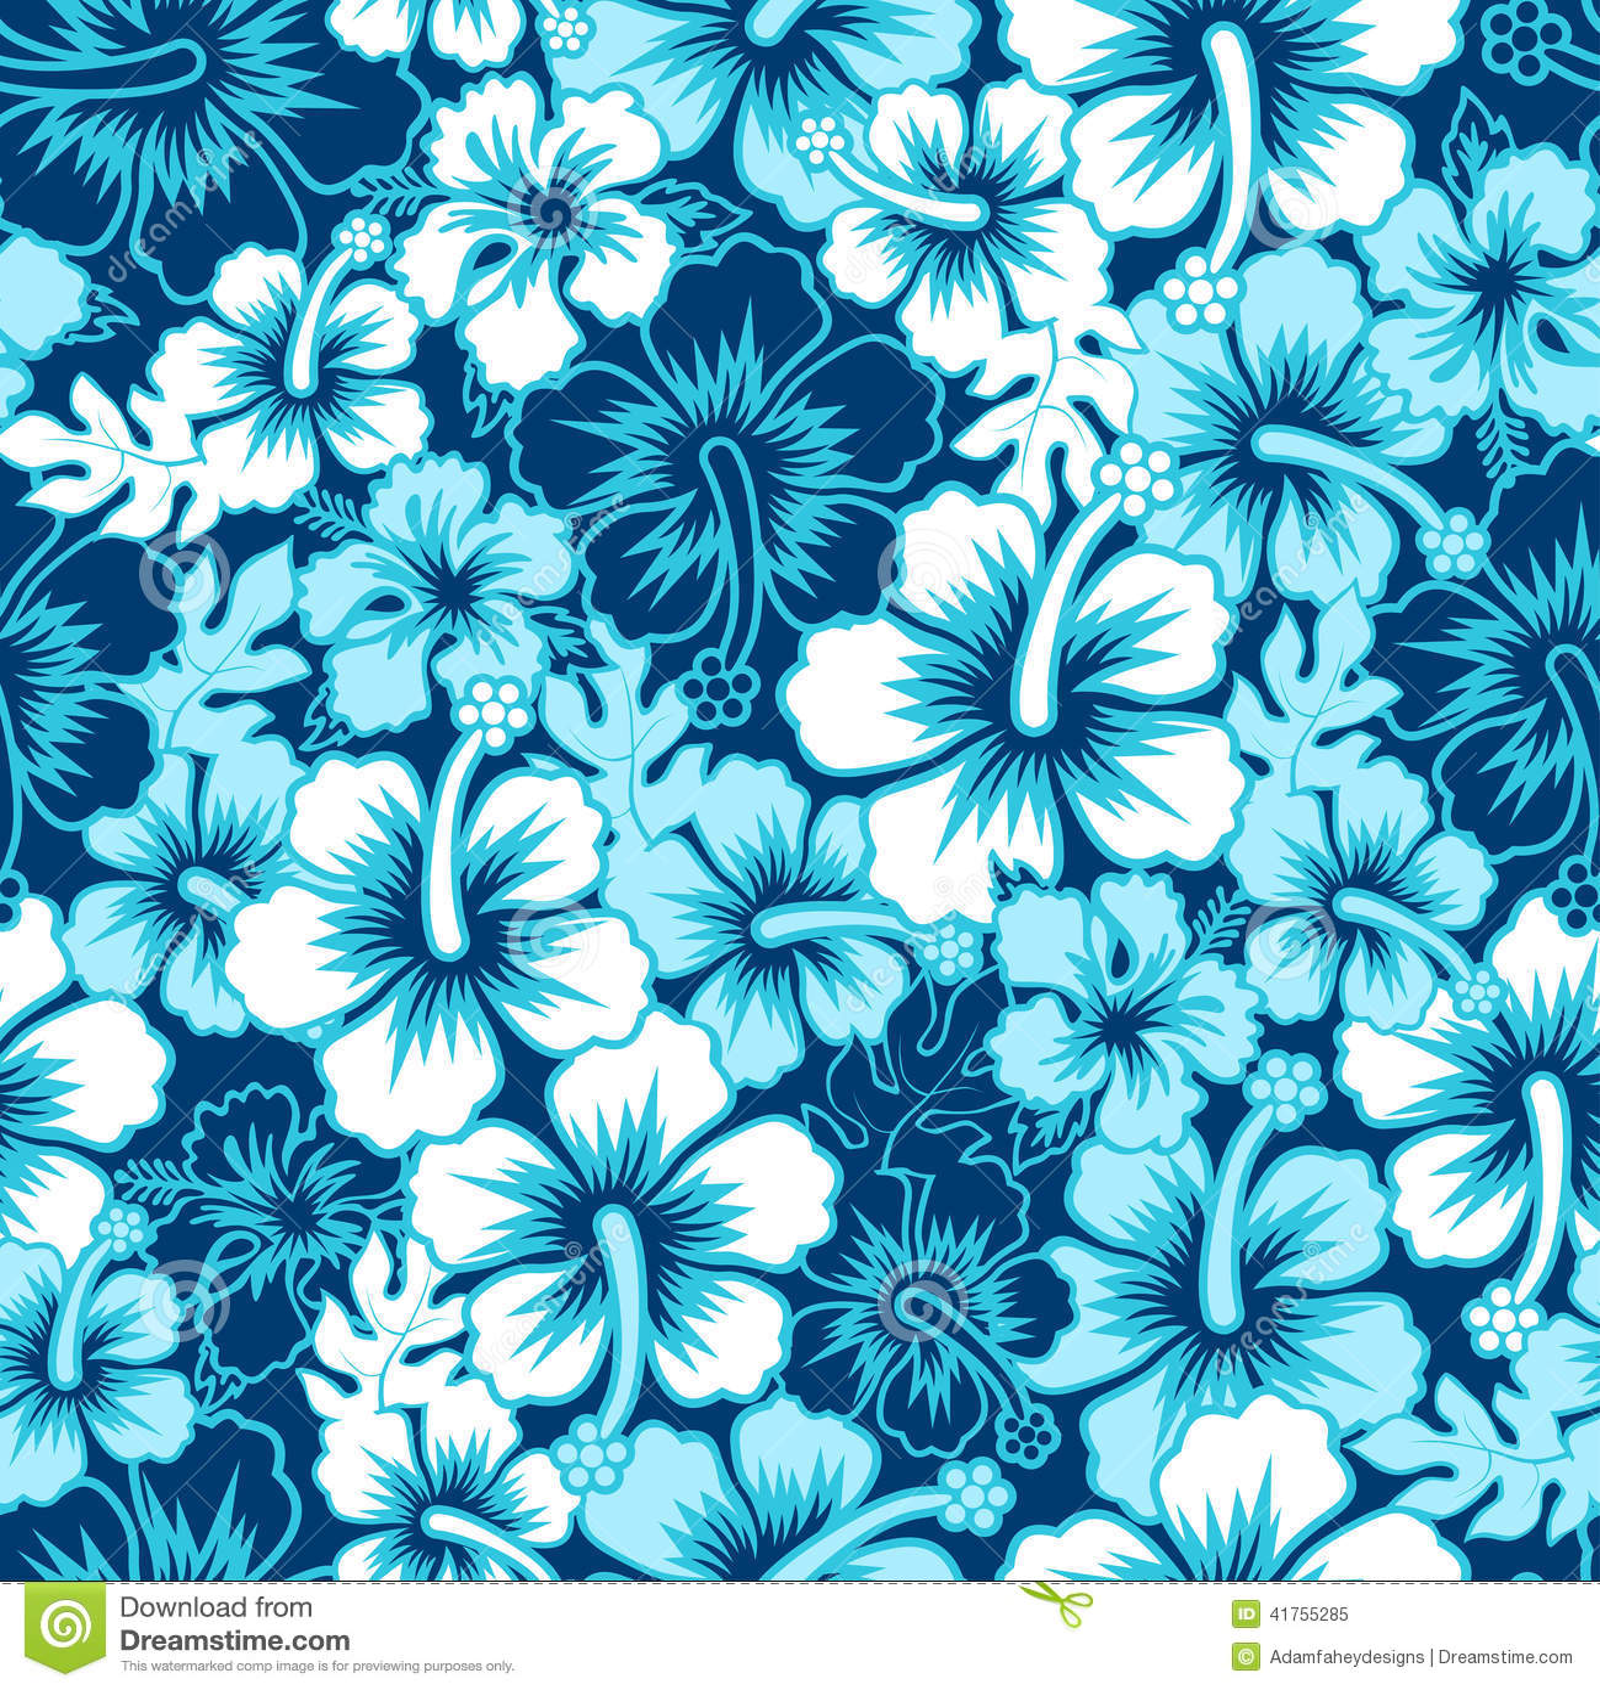 hawiian background